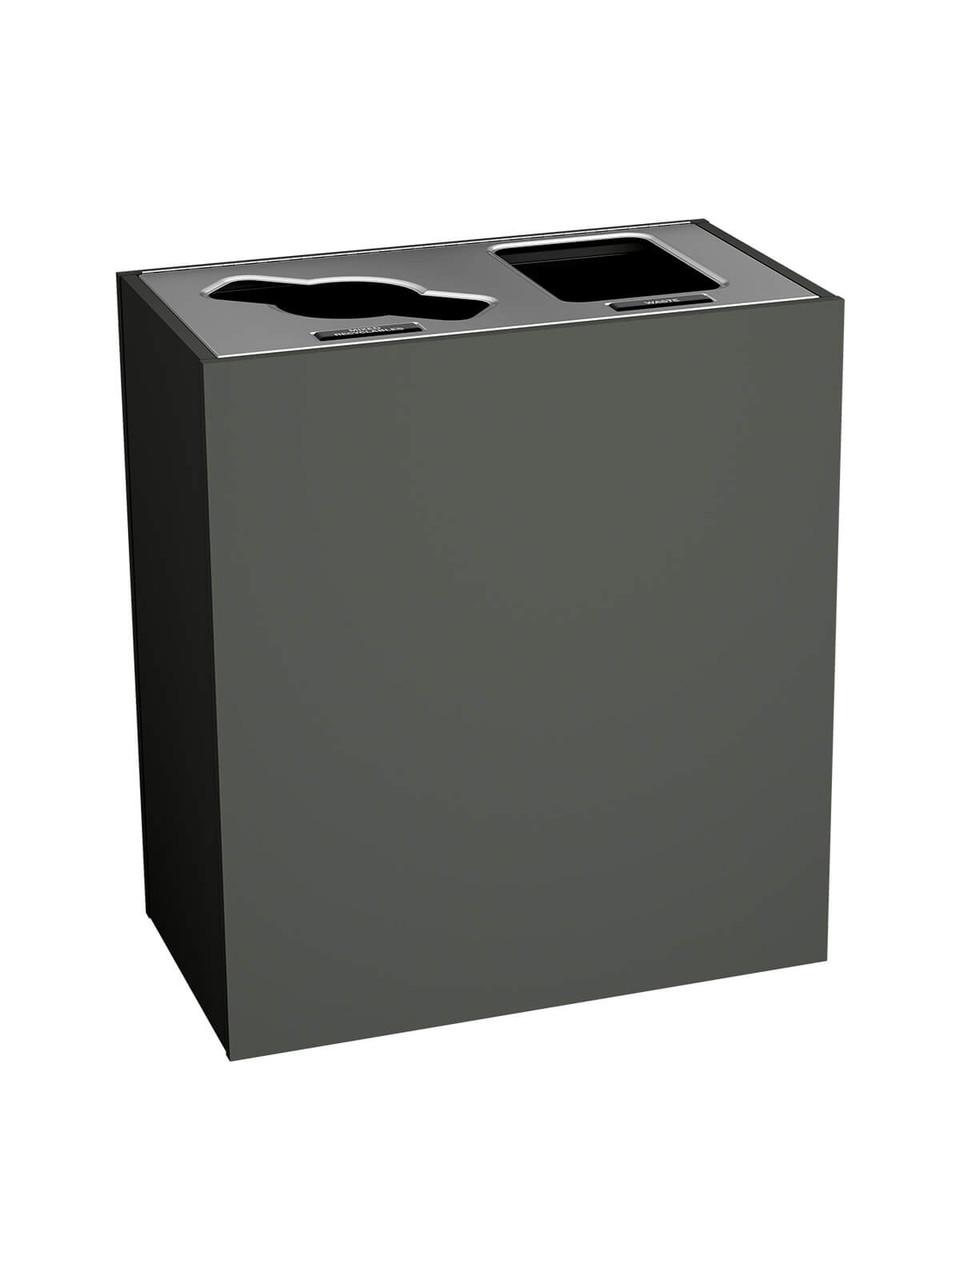 2 Stream 43 Gallon Aristata Tier 2 Recycling Bin 90927 Slate, Mixed, Full Openings